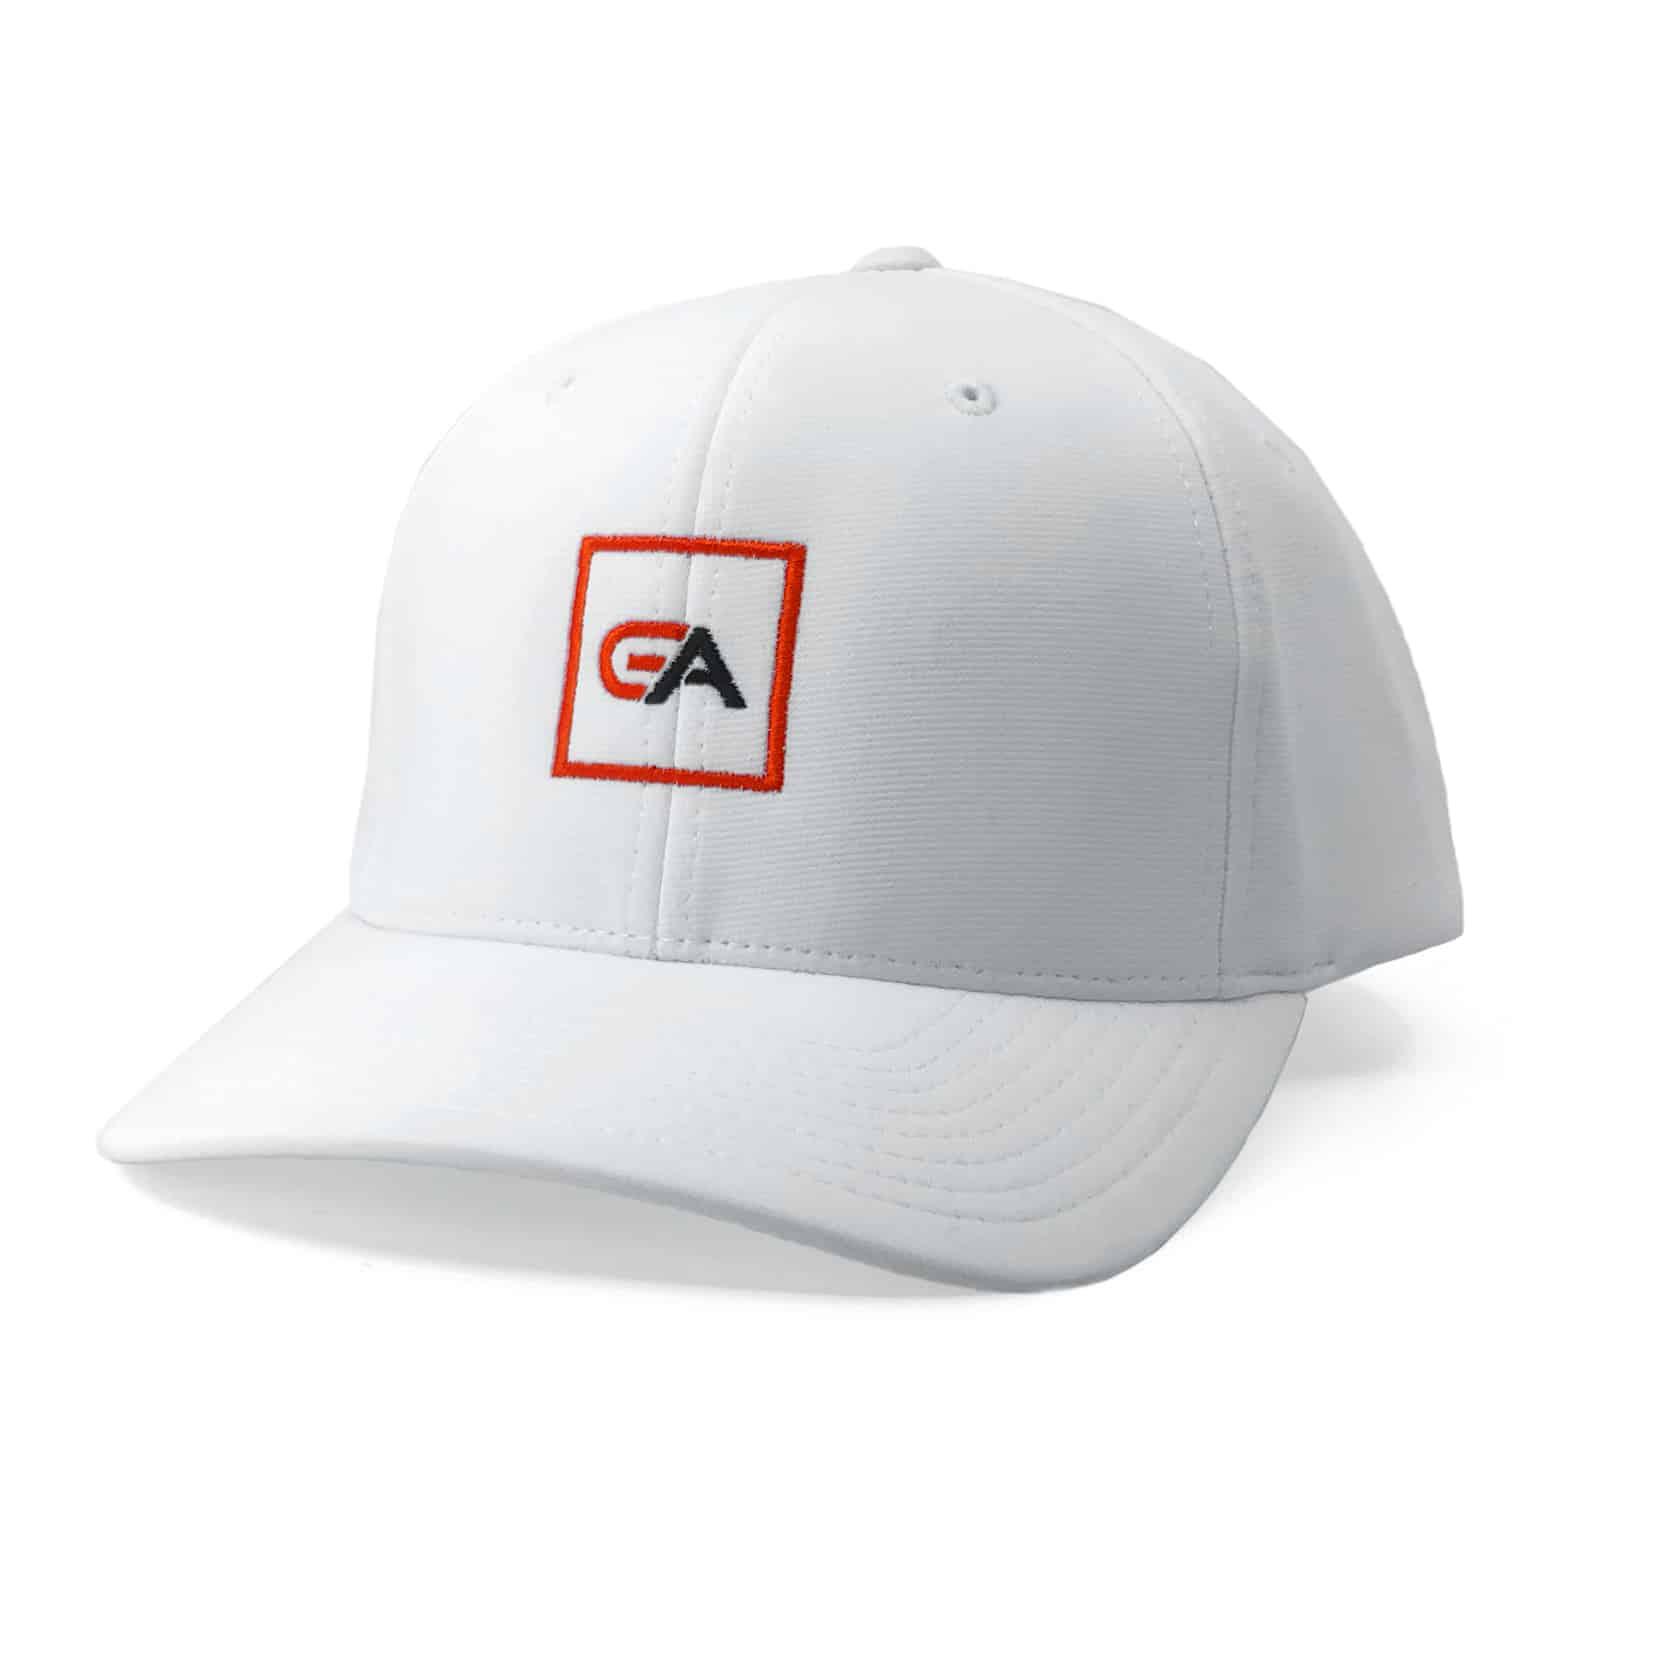 ga1 1 1 1